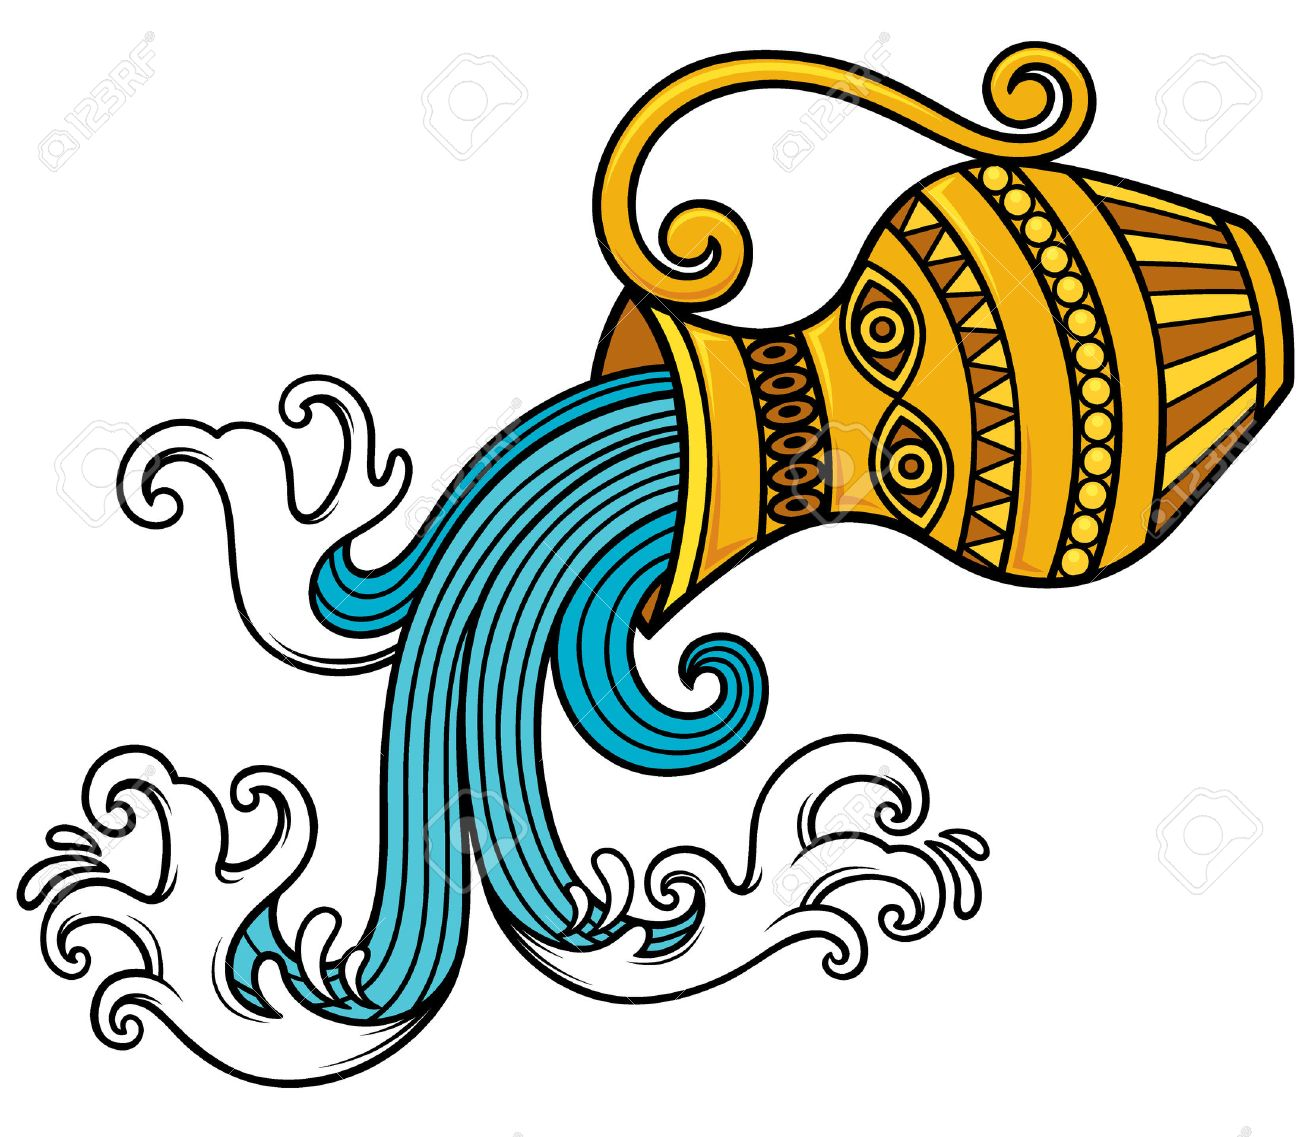 Vector - Vector Illustration of Aquarius zodiac sign